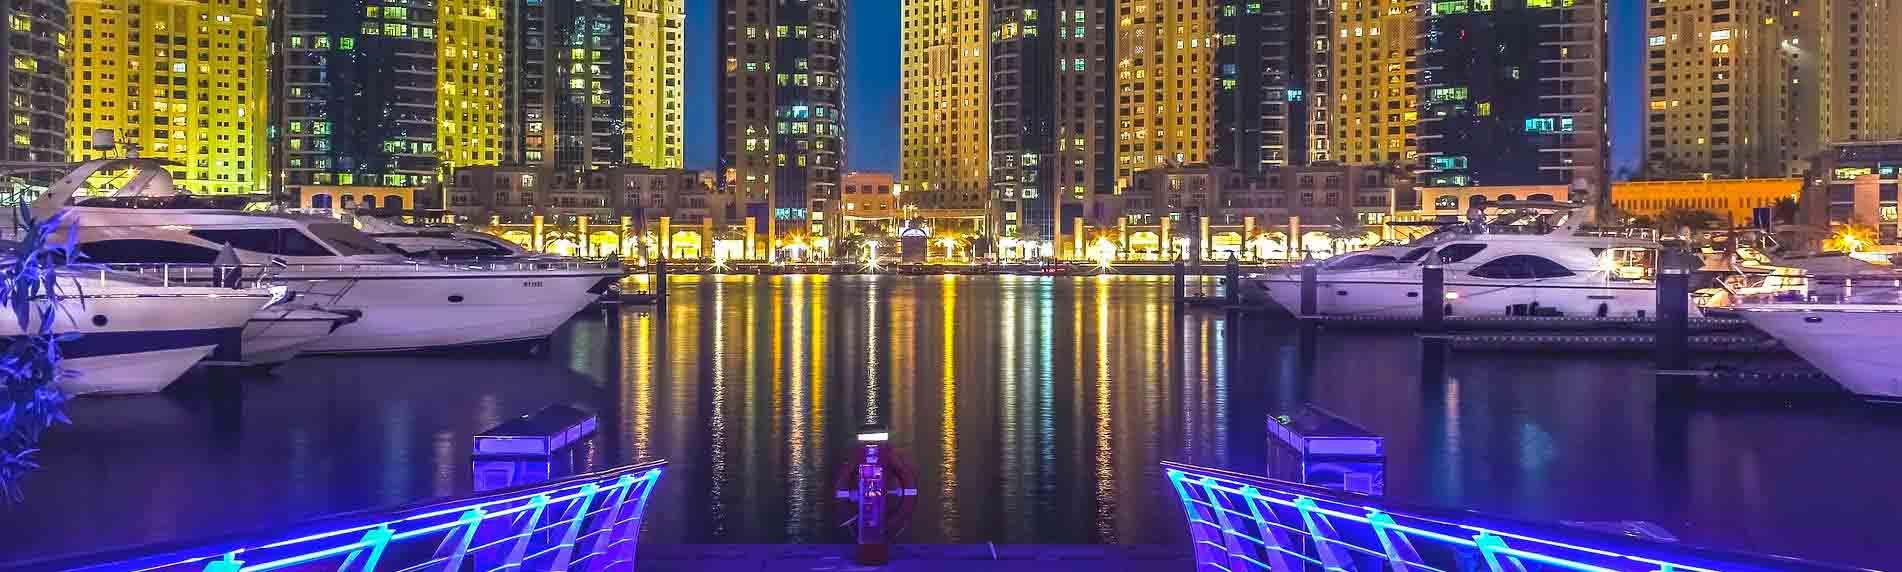 Fun Vacations Dubai and Abu Dhabi 6 Nights